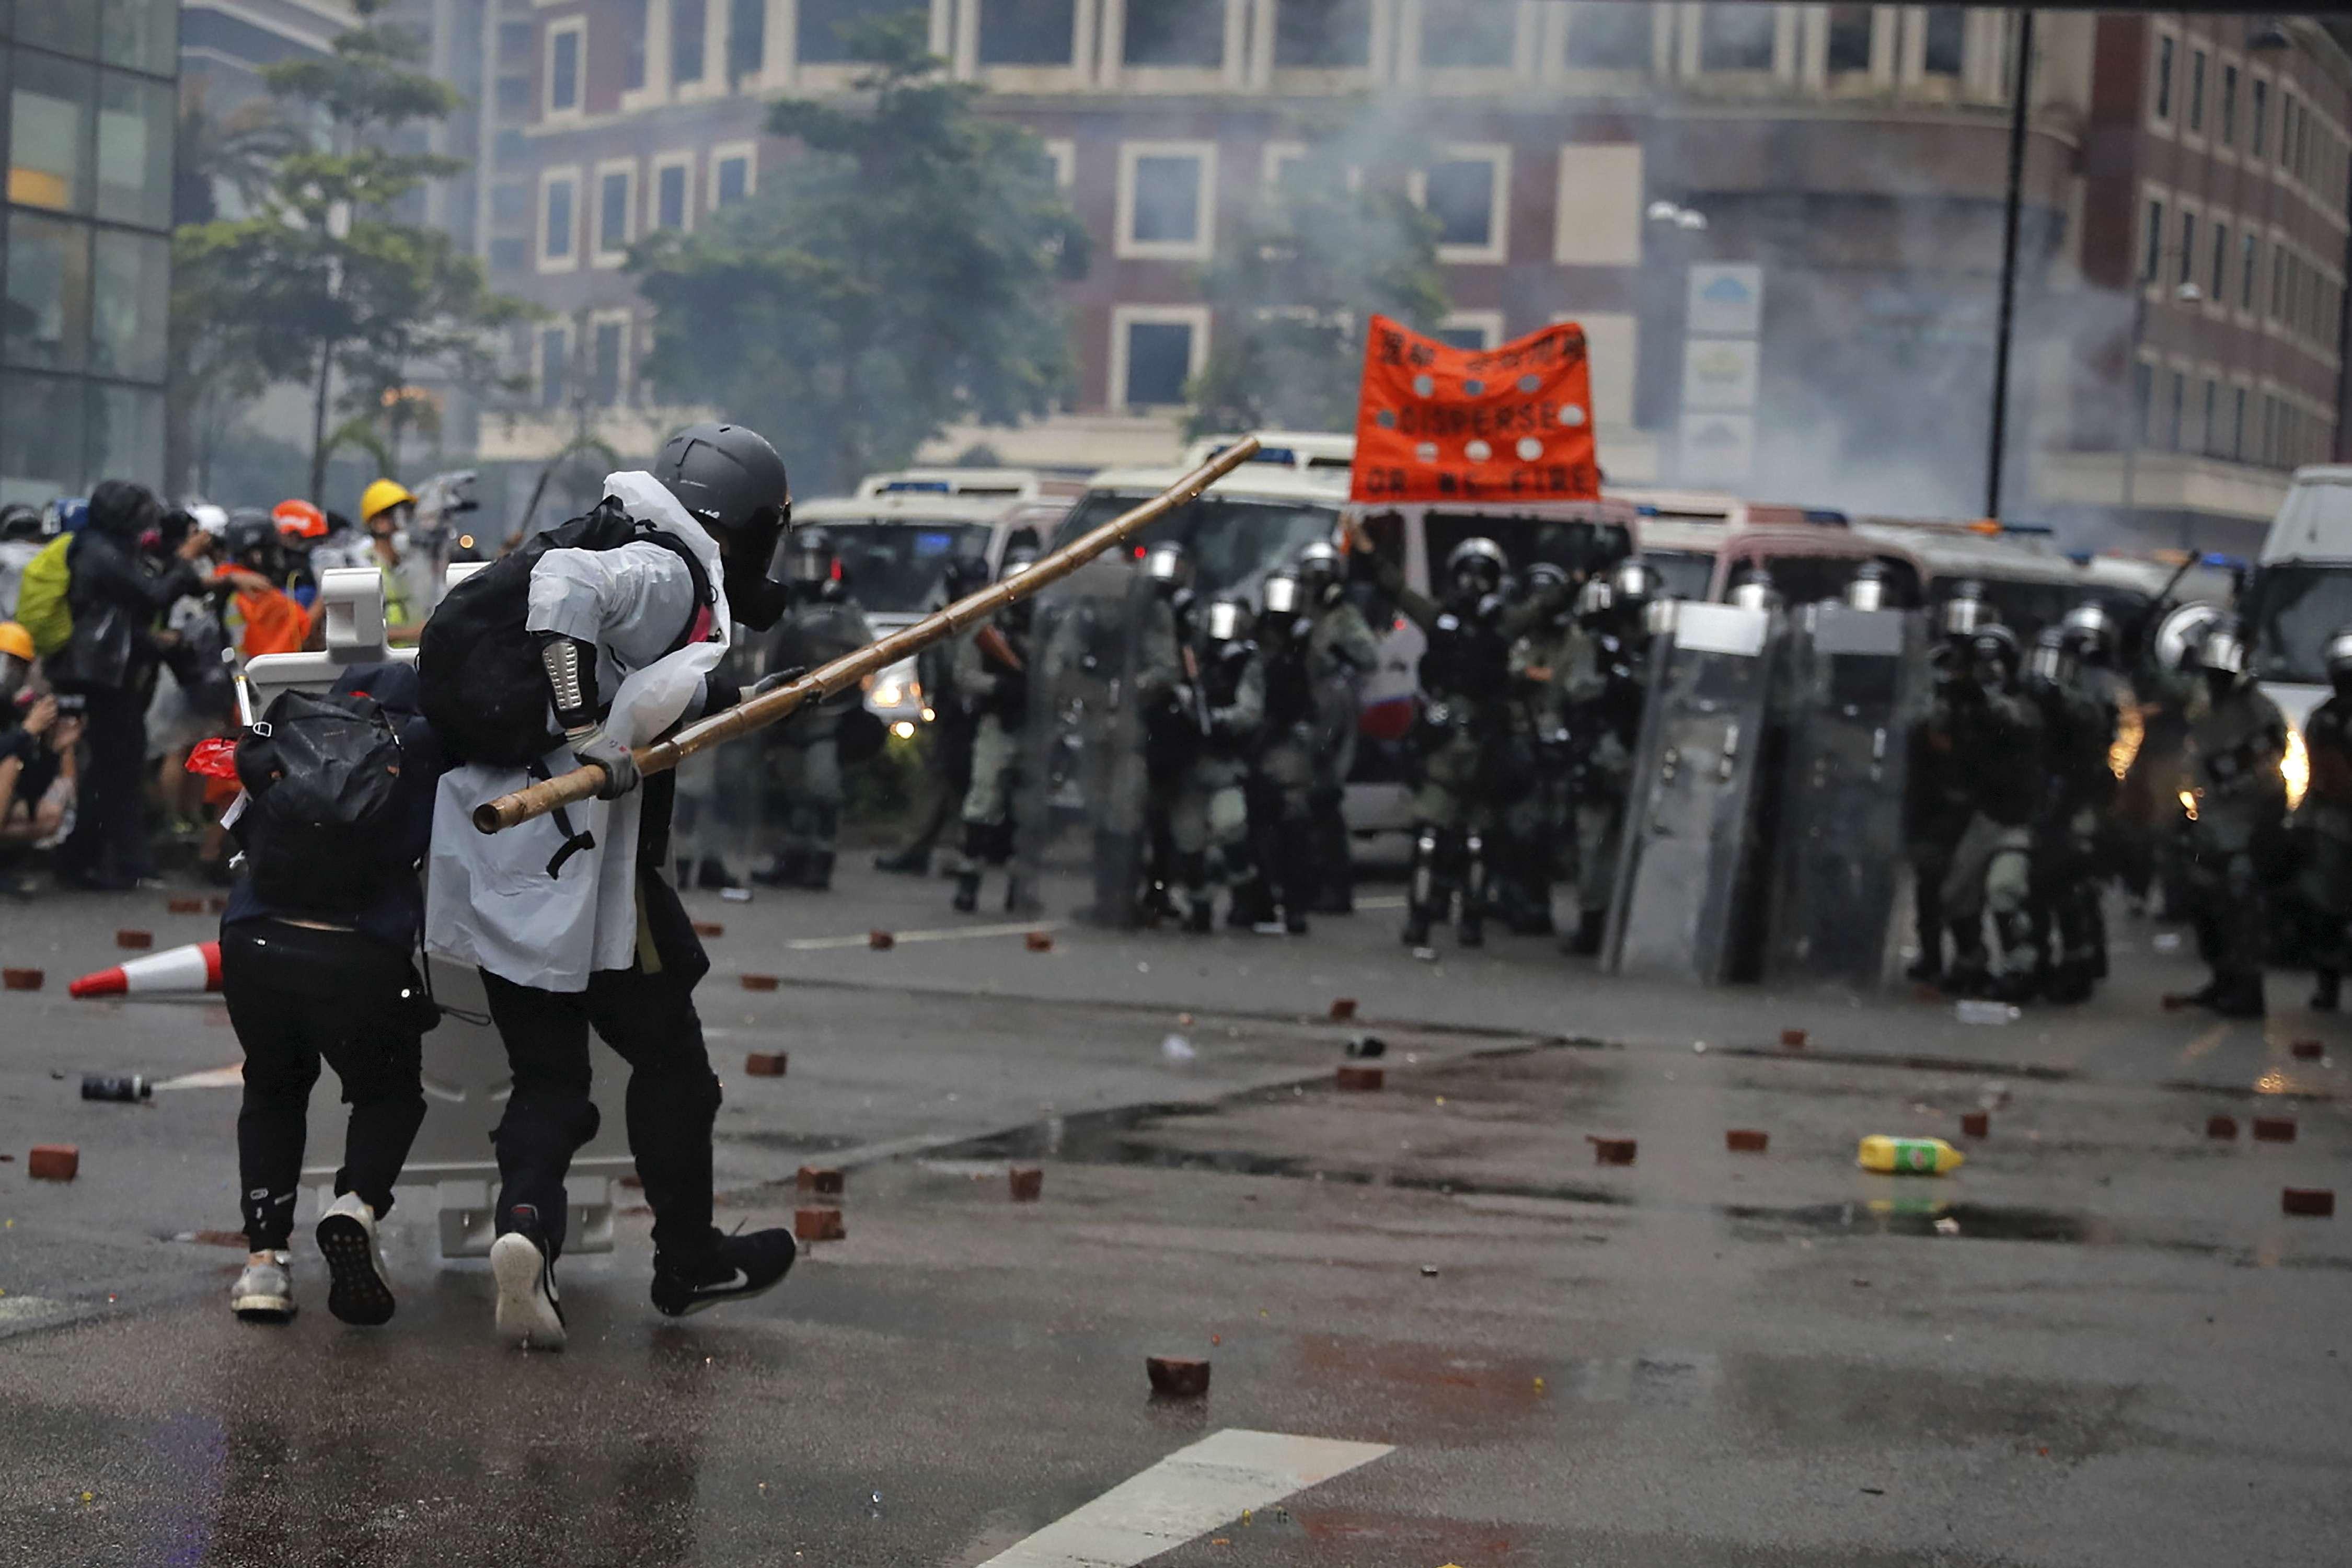 hong_kong_protest_25aug19.jpg